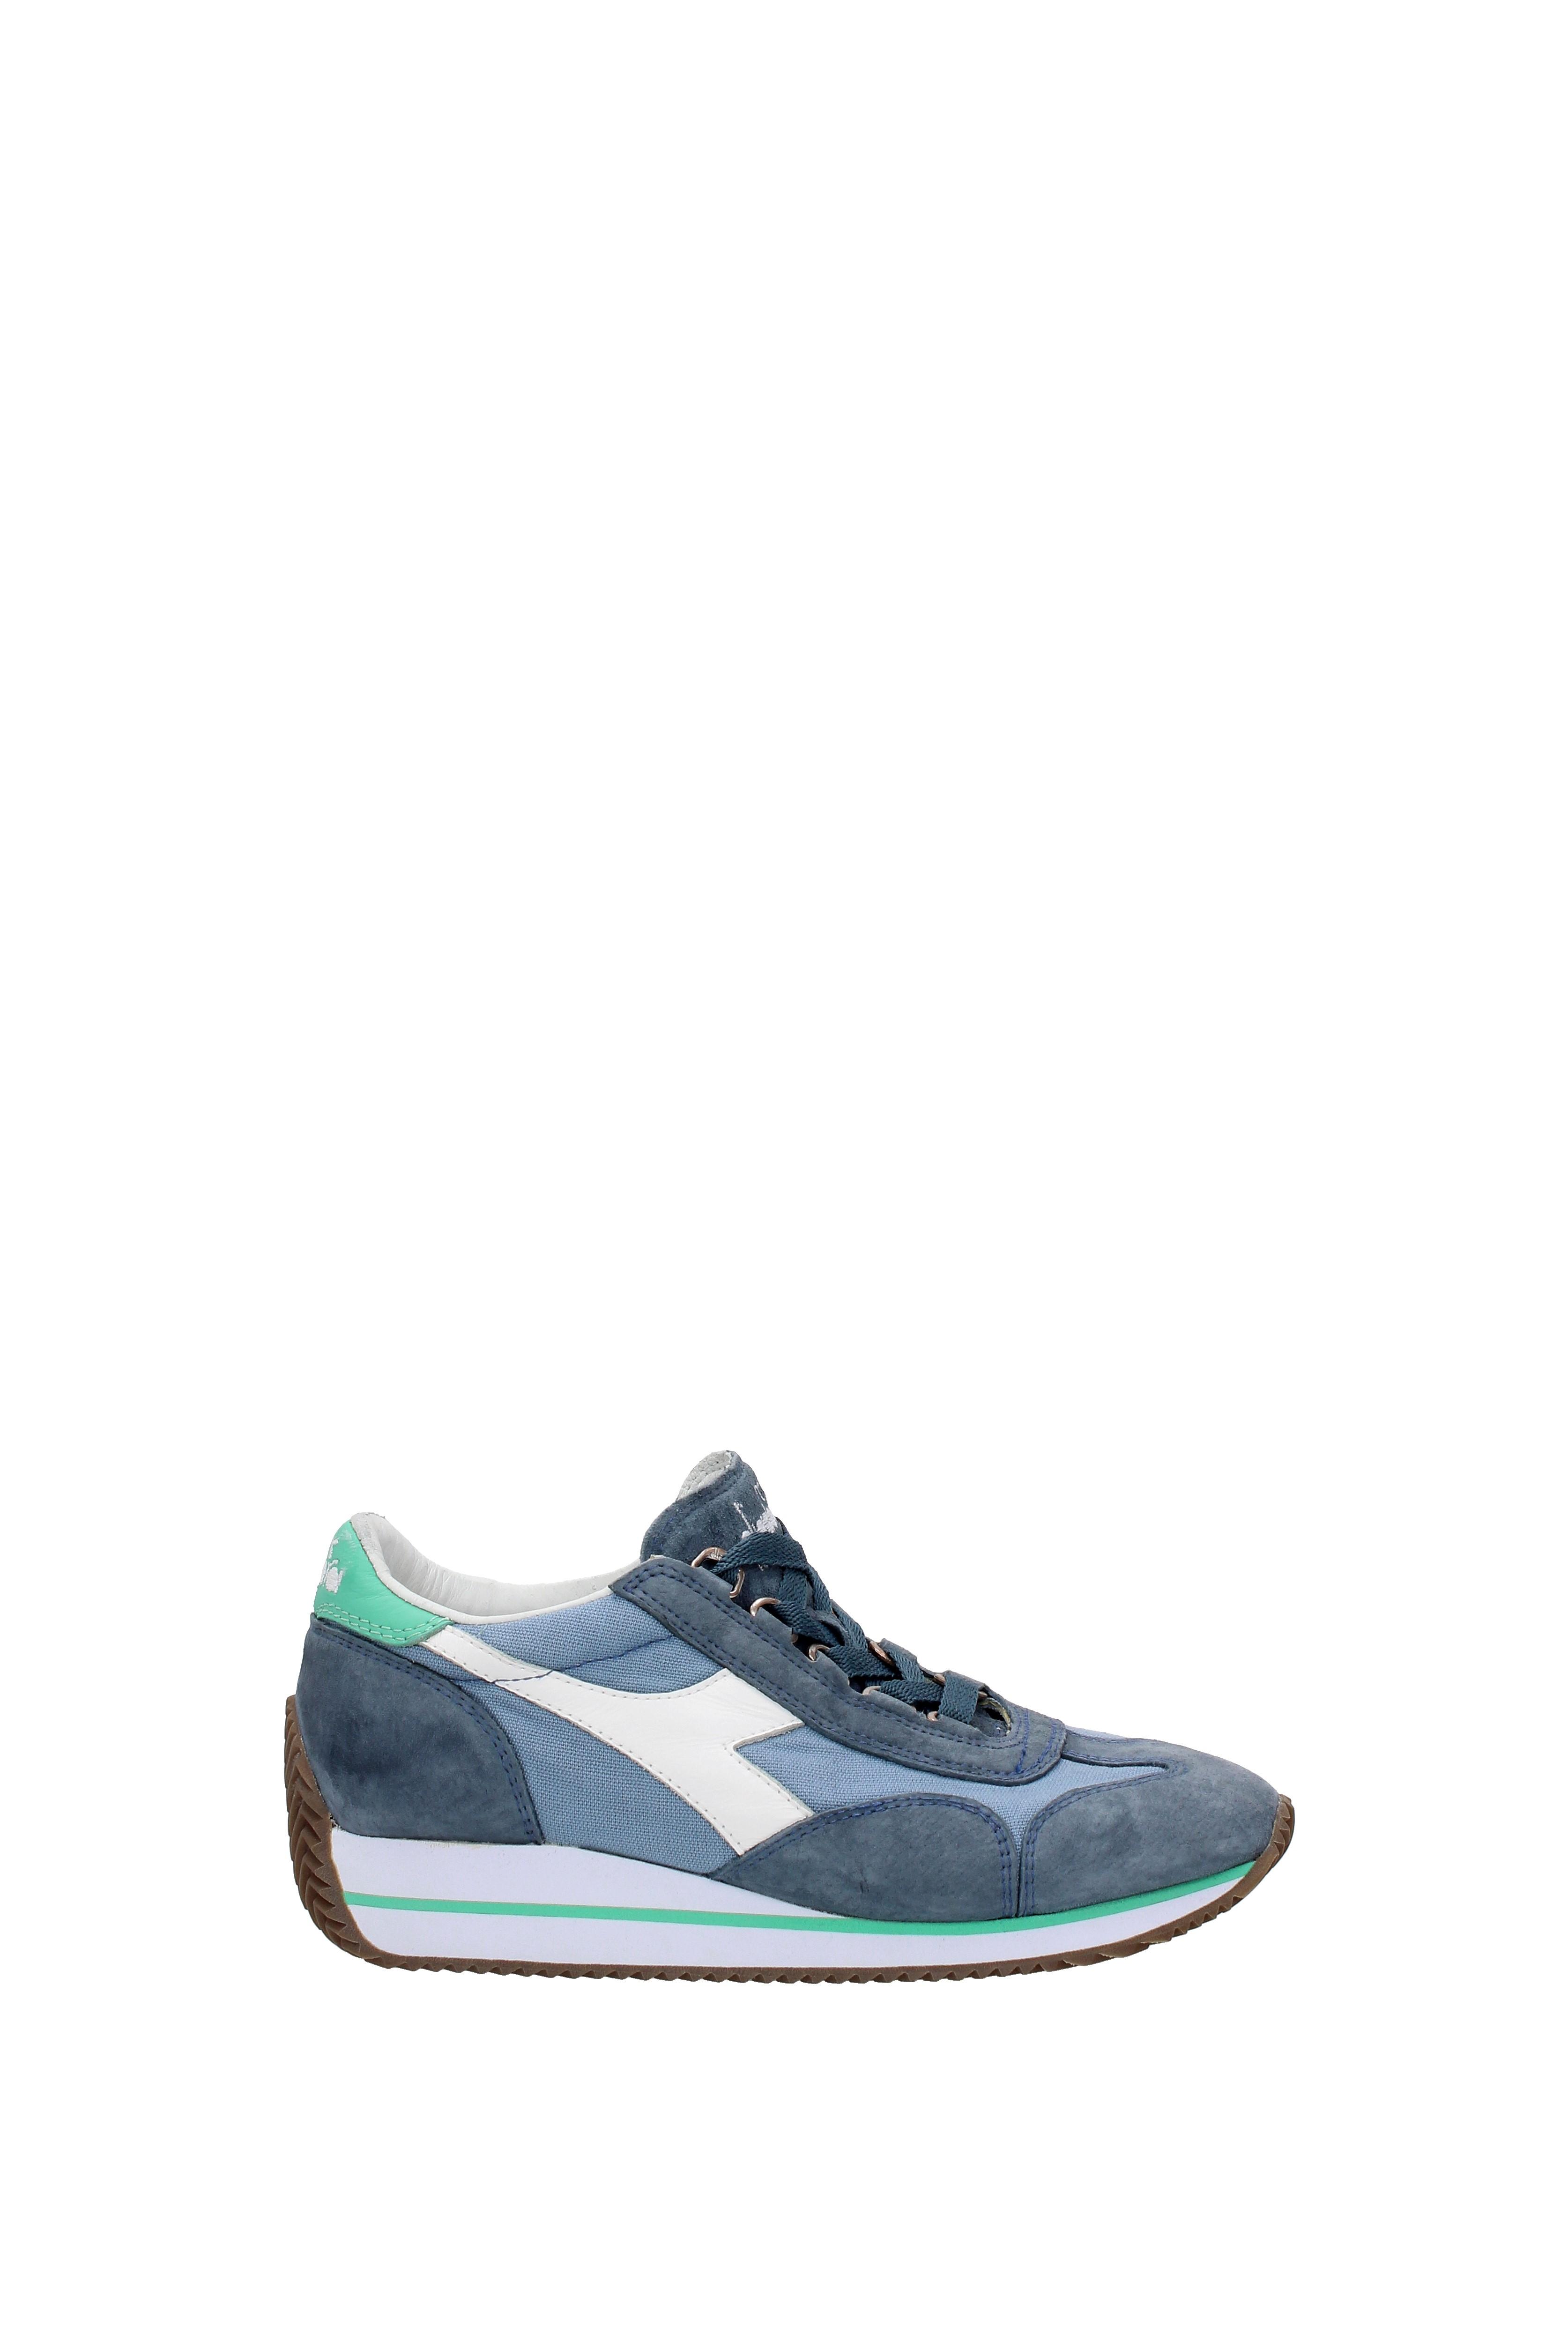 Sneakers Diadora Damenschuhe Heritage equipe w sw hh  Damenschuhe Diadora - Camoscio (20115603001) 5814d4